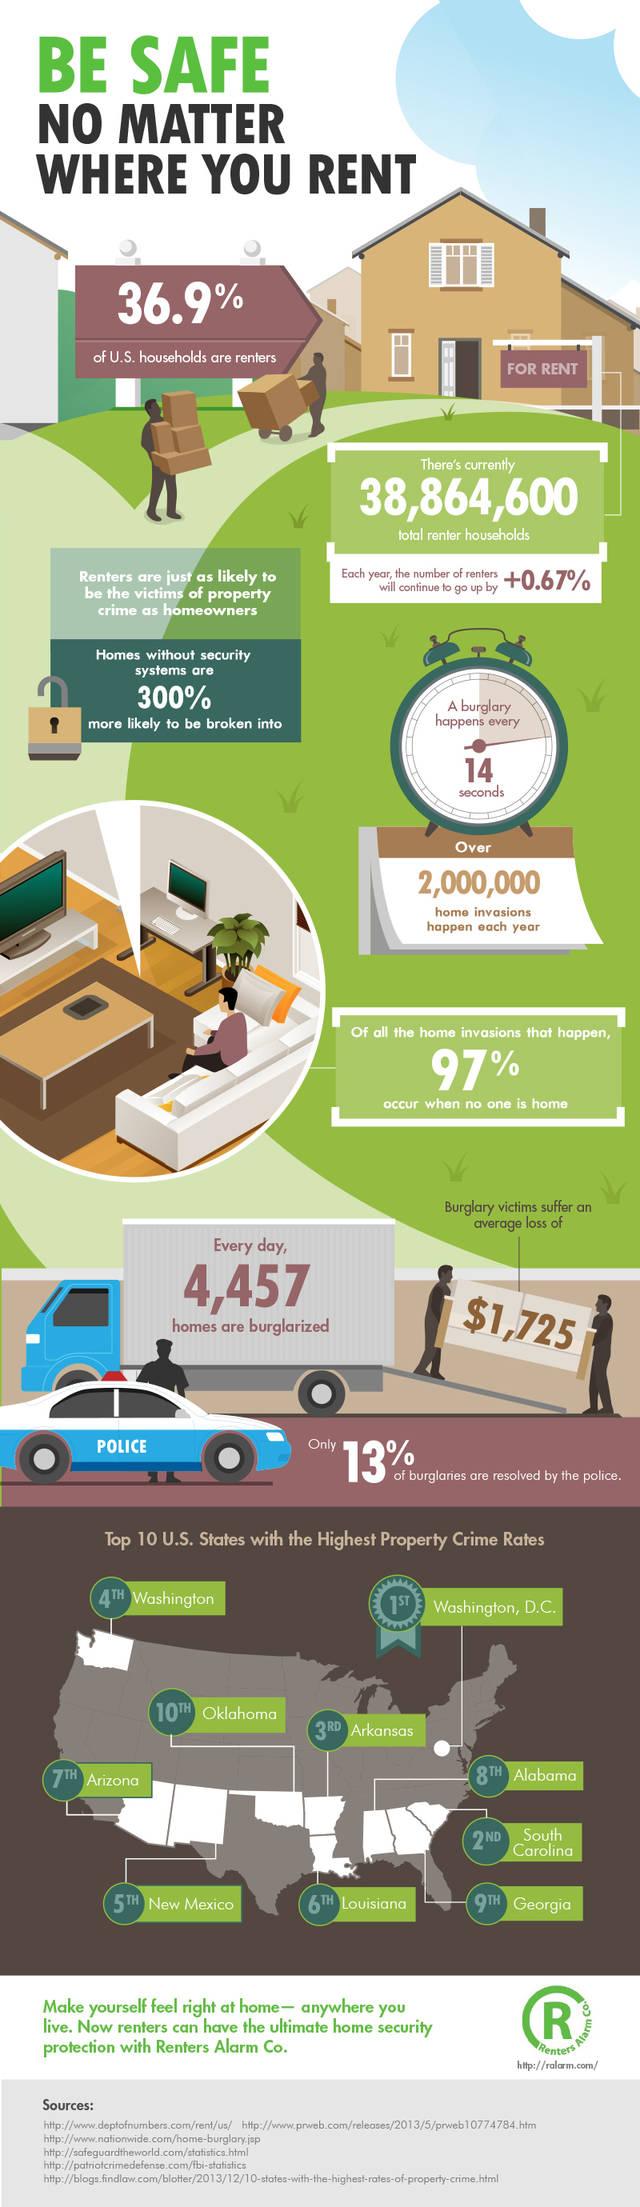 Rentersalarm infographic final